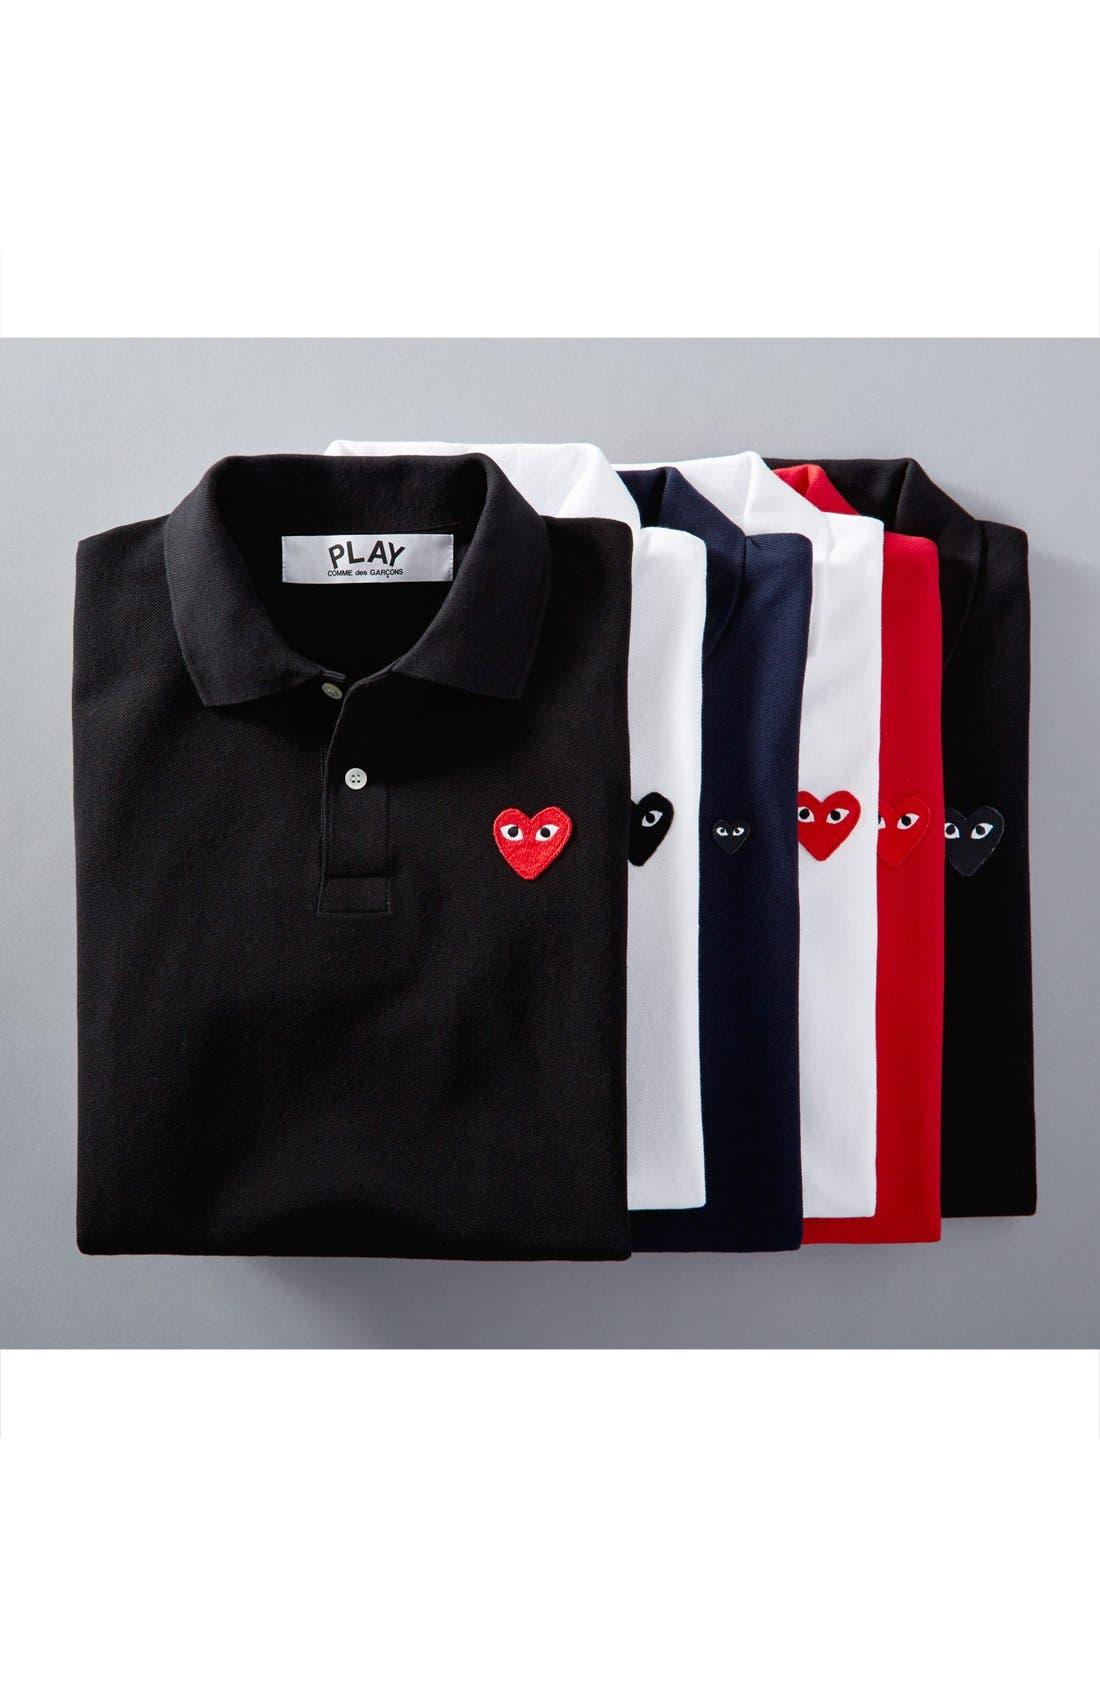 Comme des Garçons PLAY Piqué Polo with Heart Appliqué,                             Alternate thumbnail 4, color,